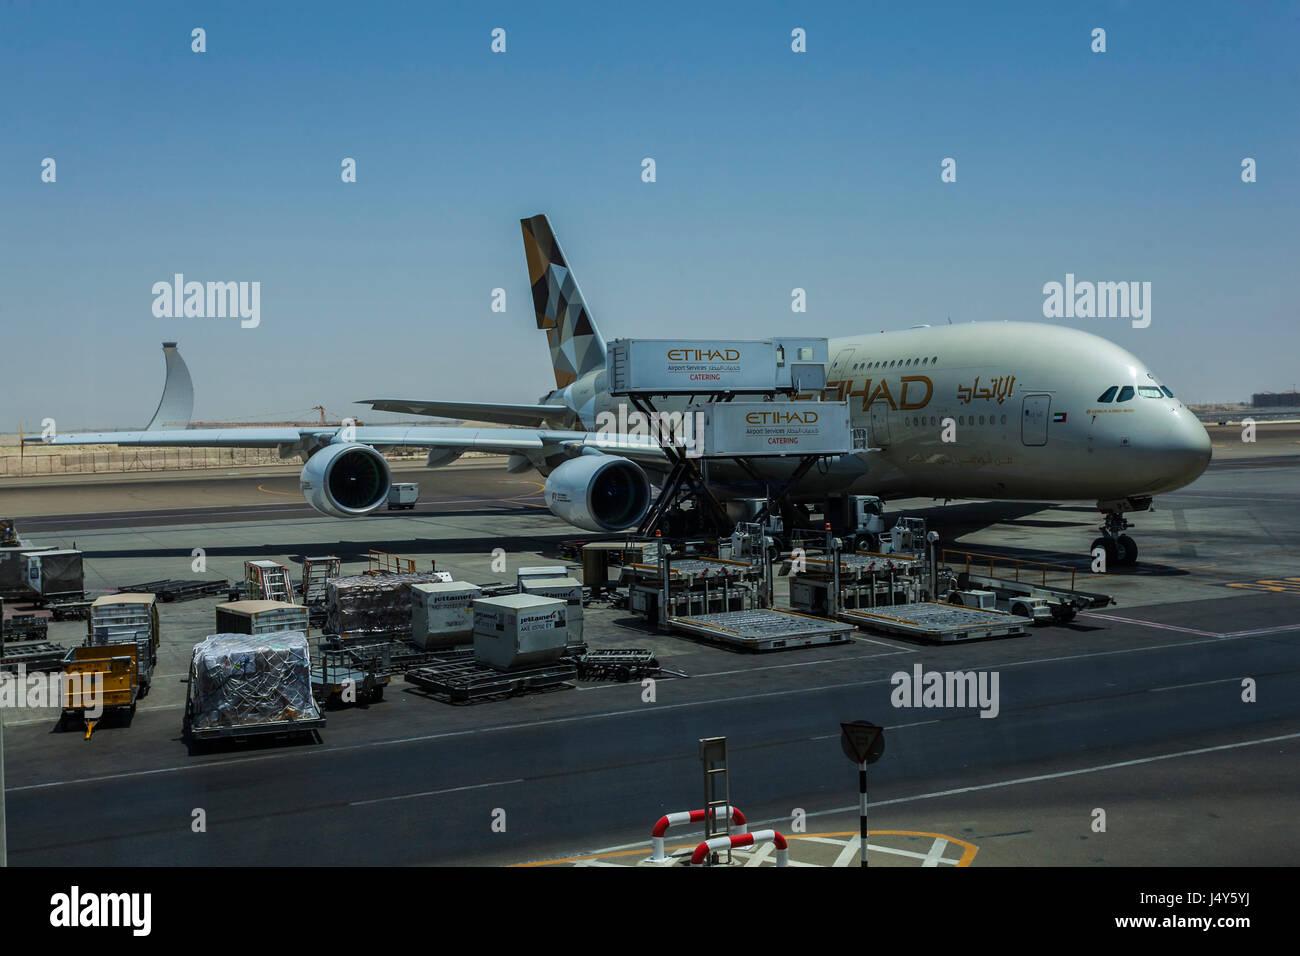 ABU DHABI AIRPORT, ABU DHABI, UAE-17TH AUG 2015:-Airplane being loaded for the flight to Australia Stock Photo